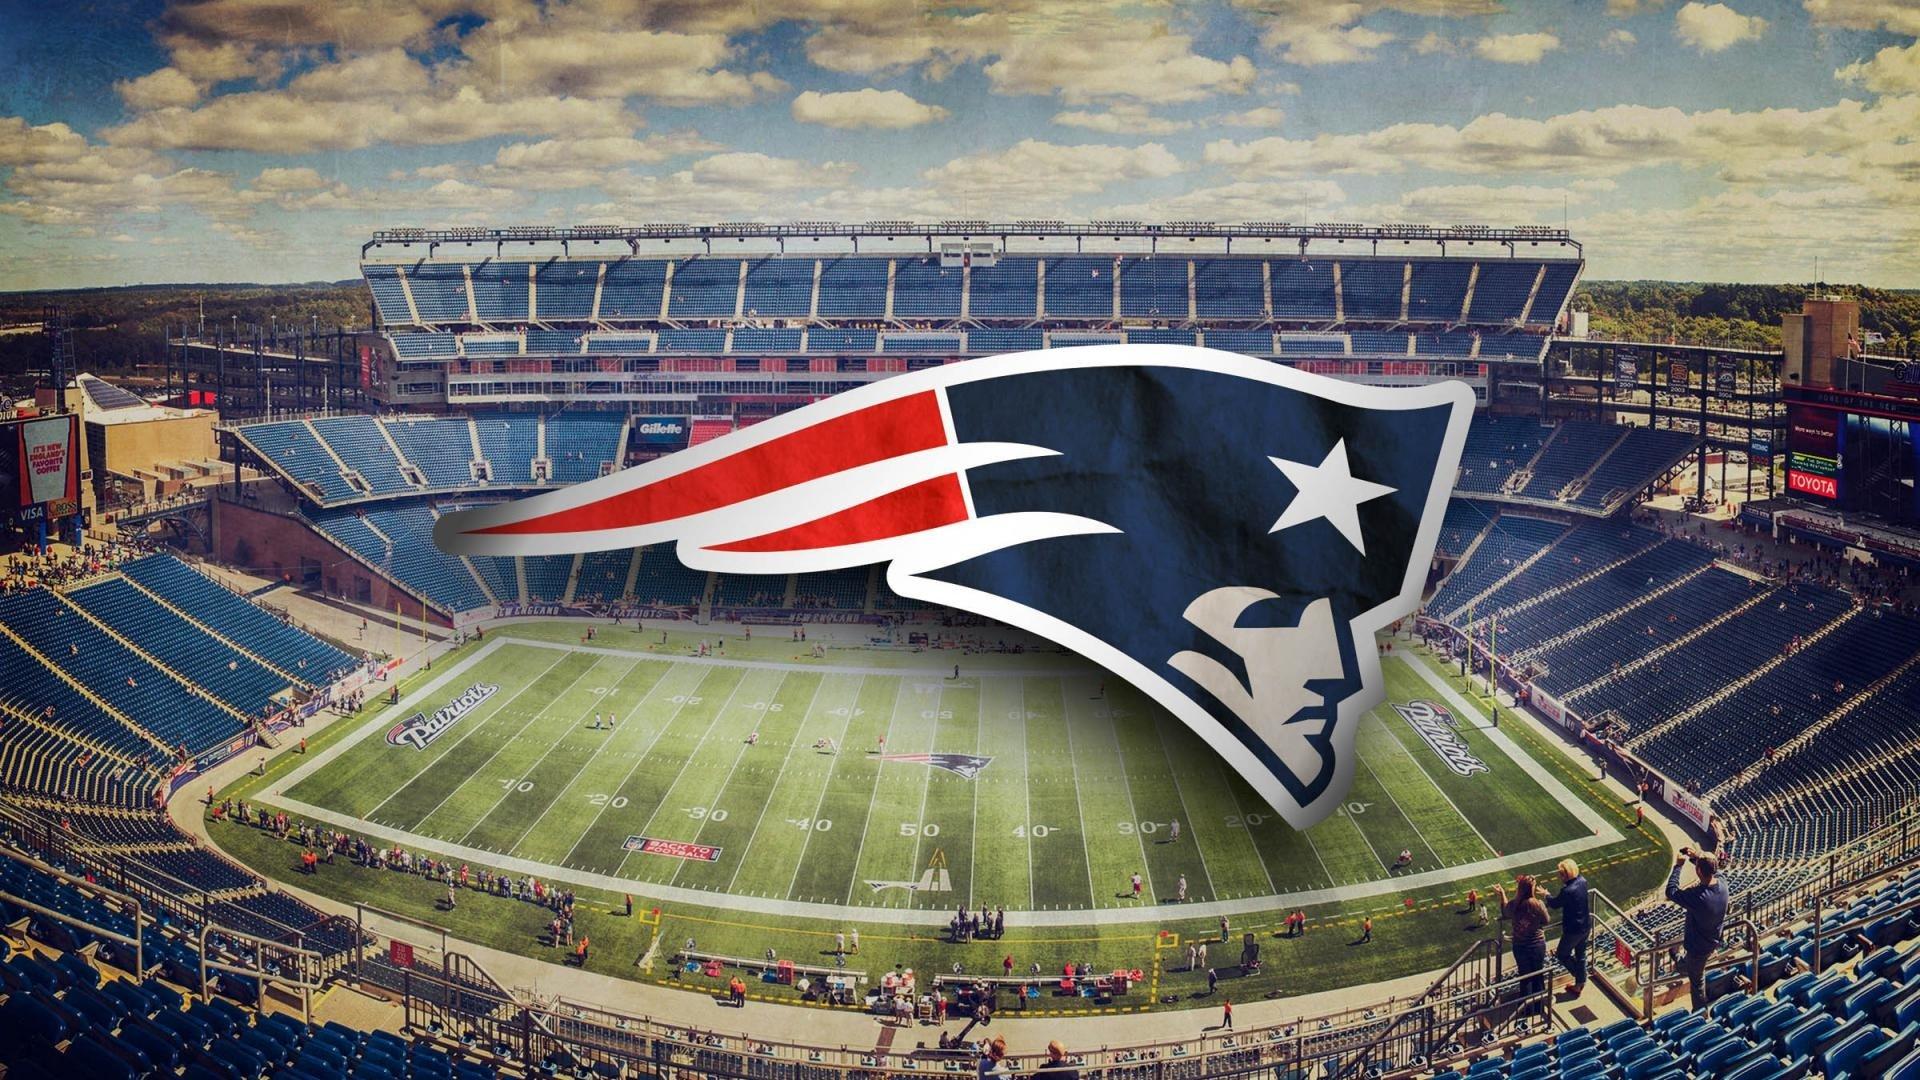 New England Patriots Iphone X Wallpaper New England Patriots Stadium Hd Wallpaper Background